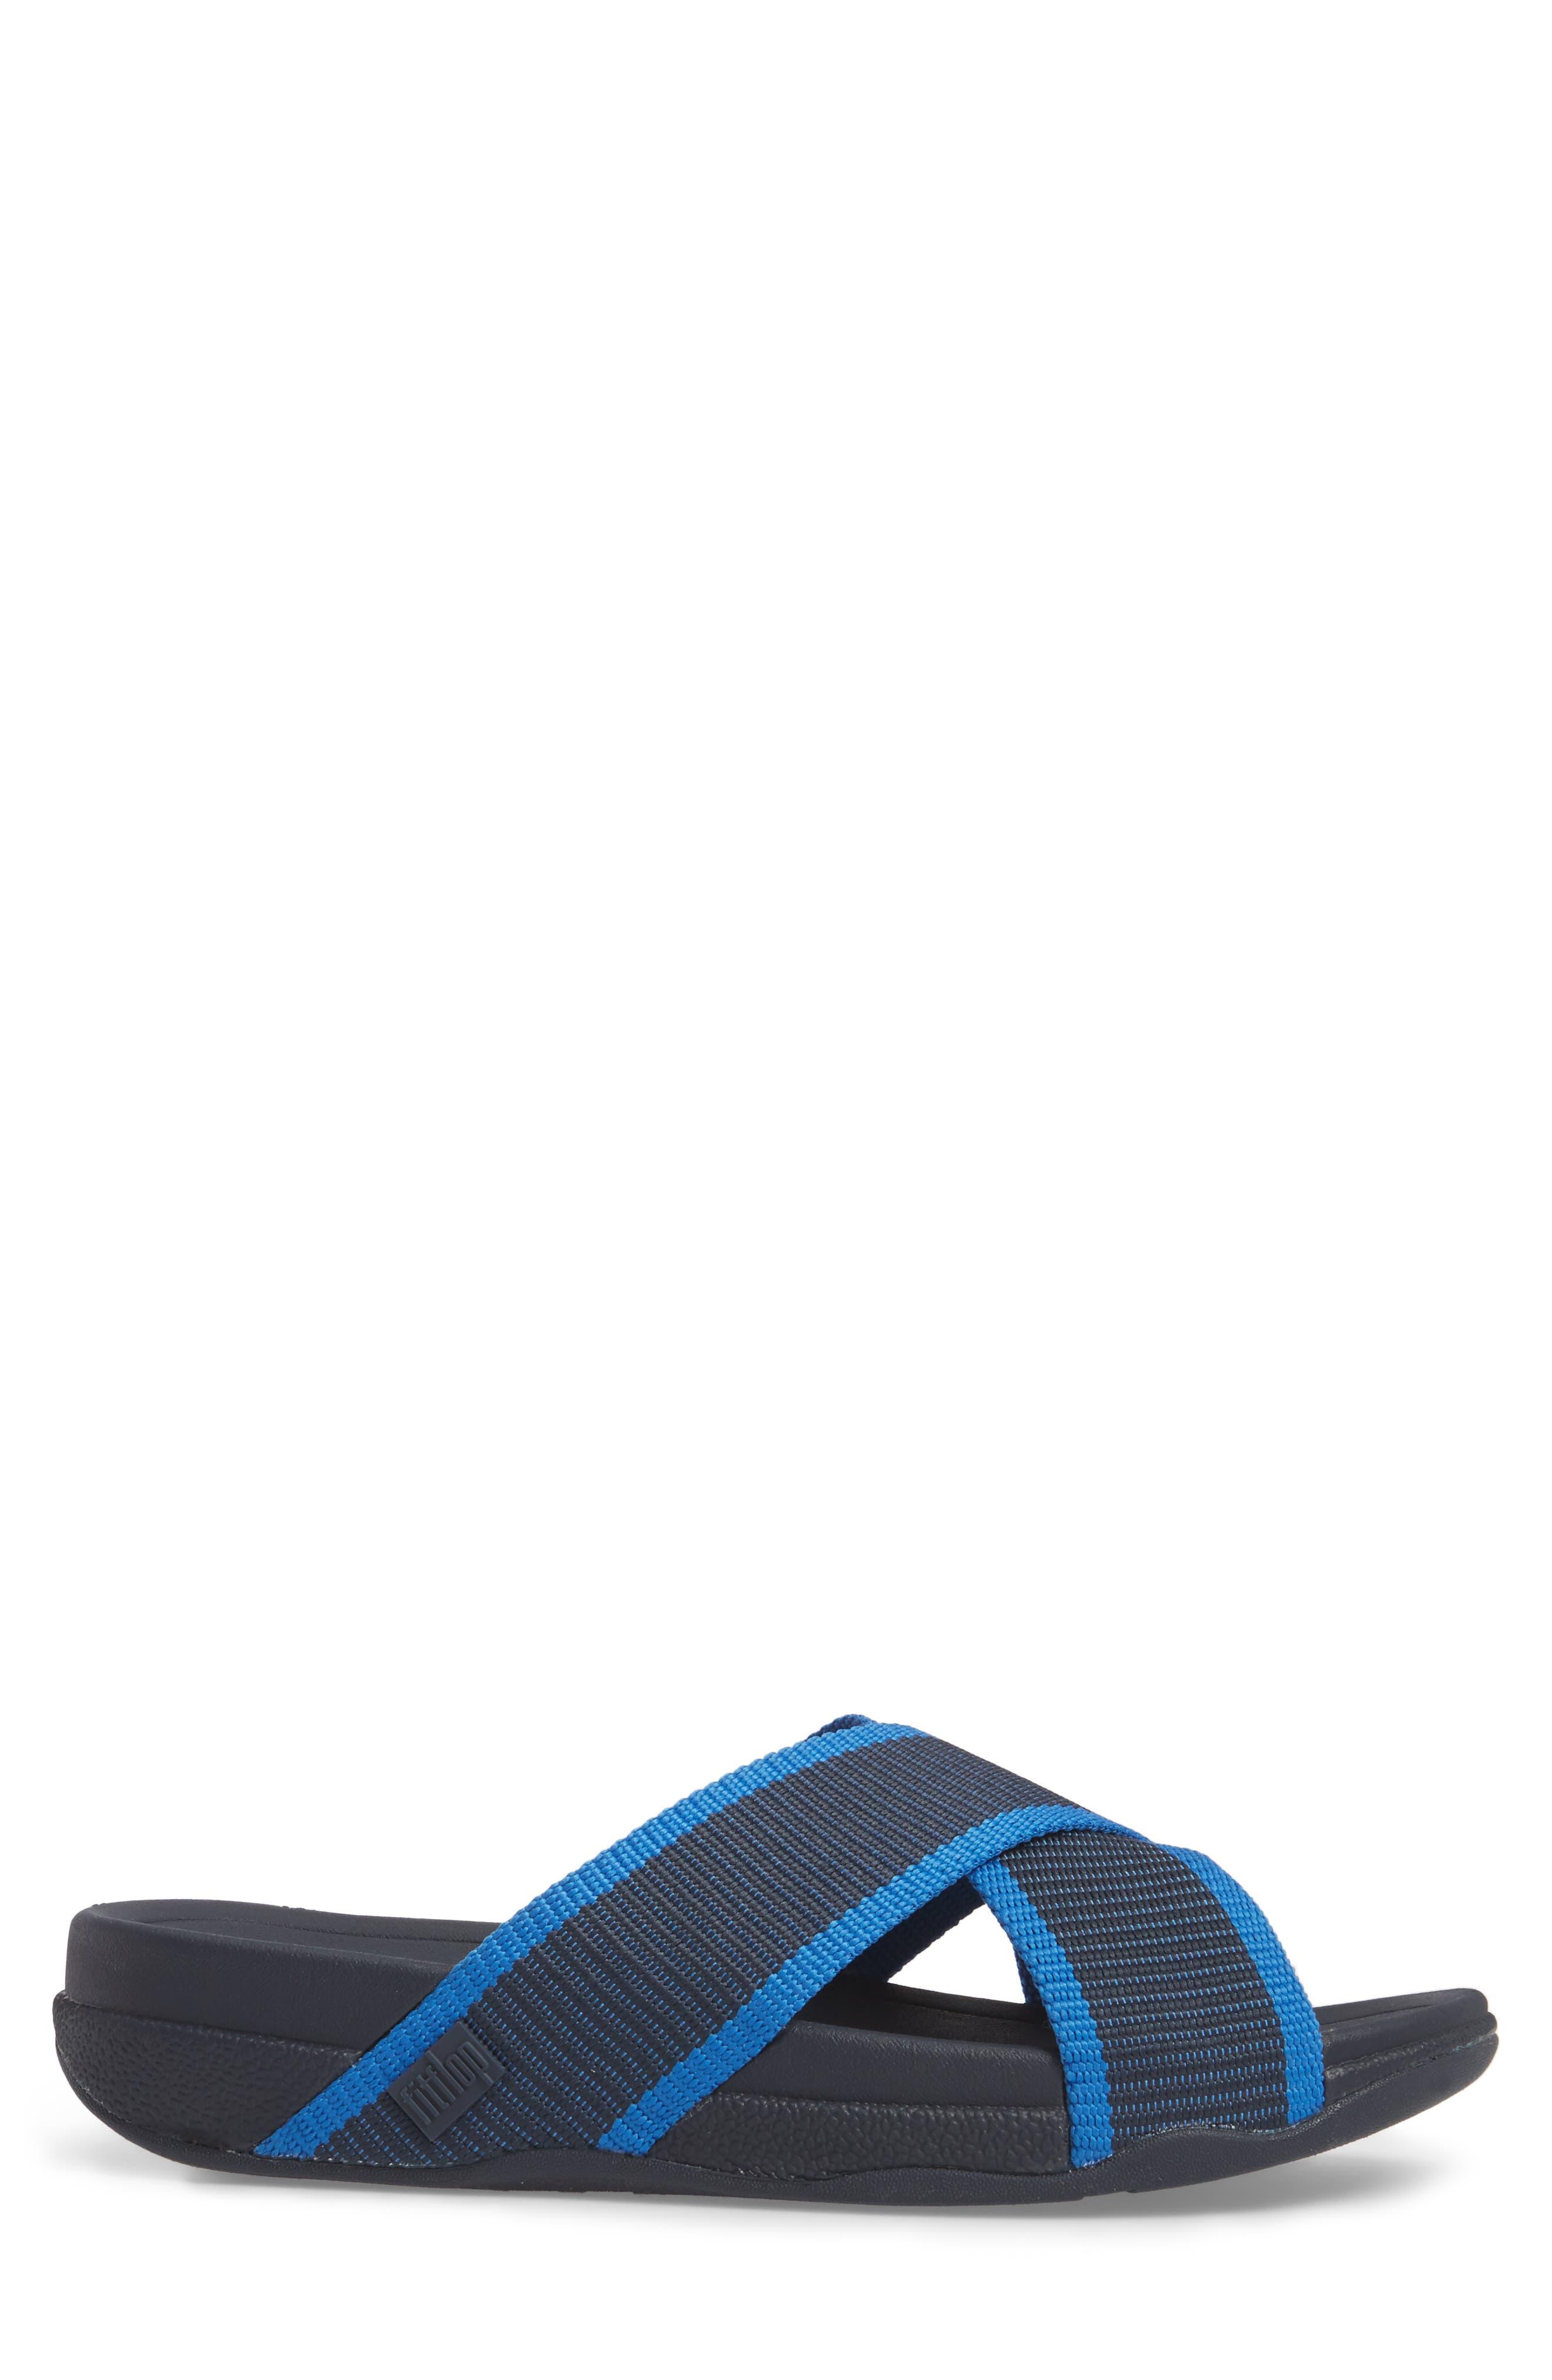 Surfer Slide Sandal,                             Alternate thumbnail 3, color,                             SUPERNAVY BLUE